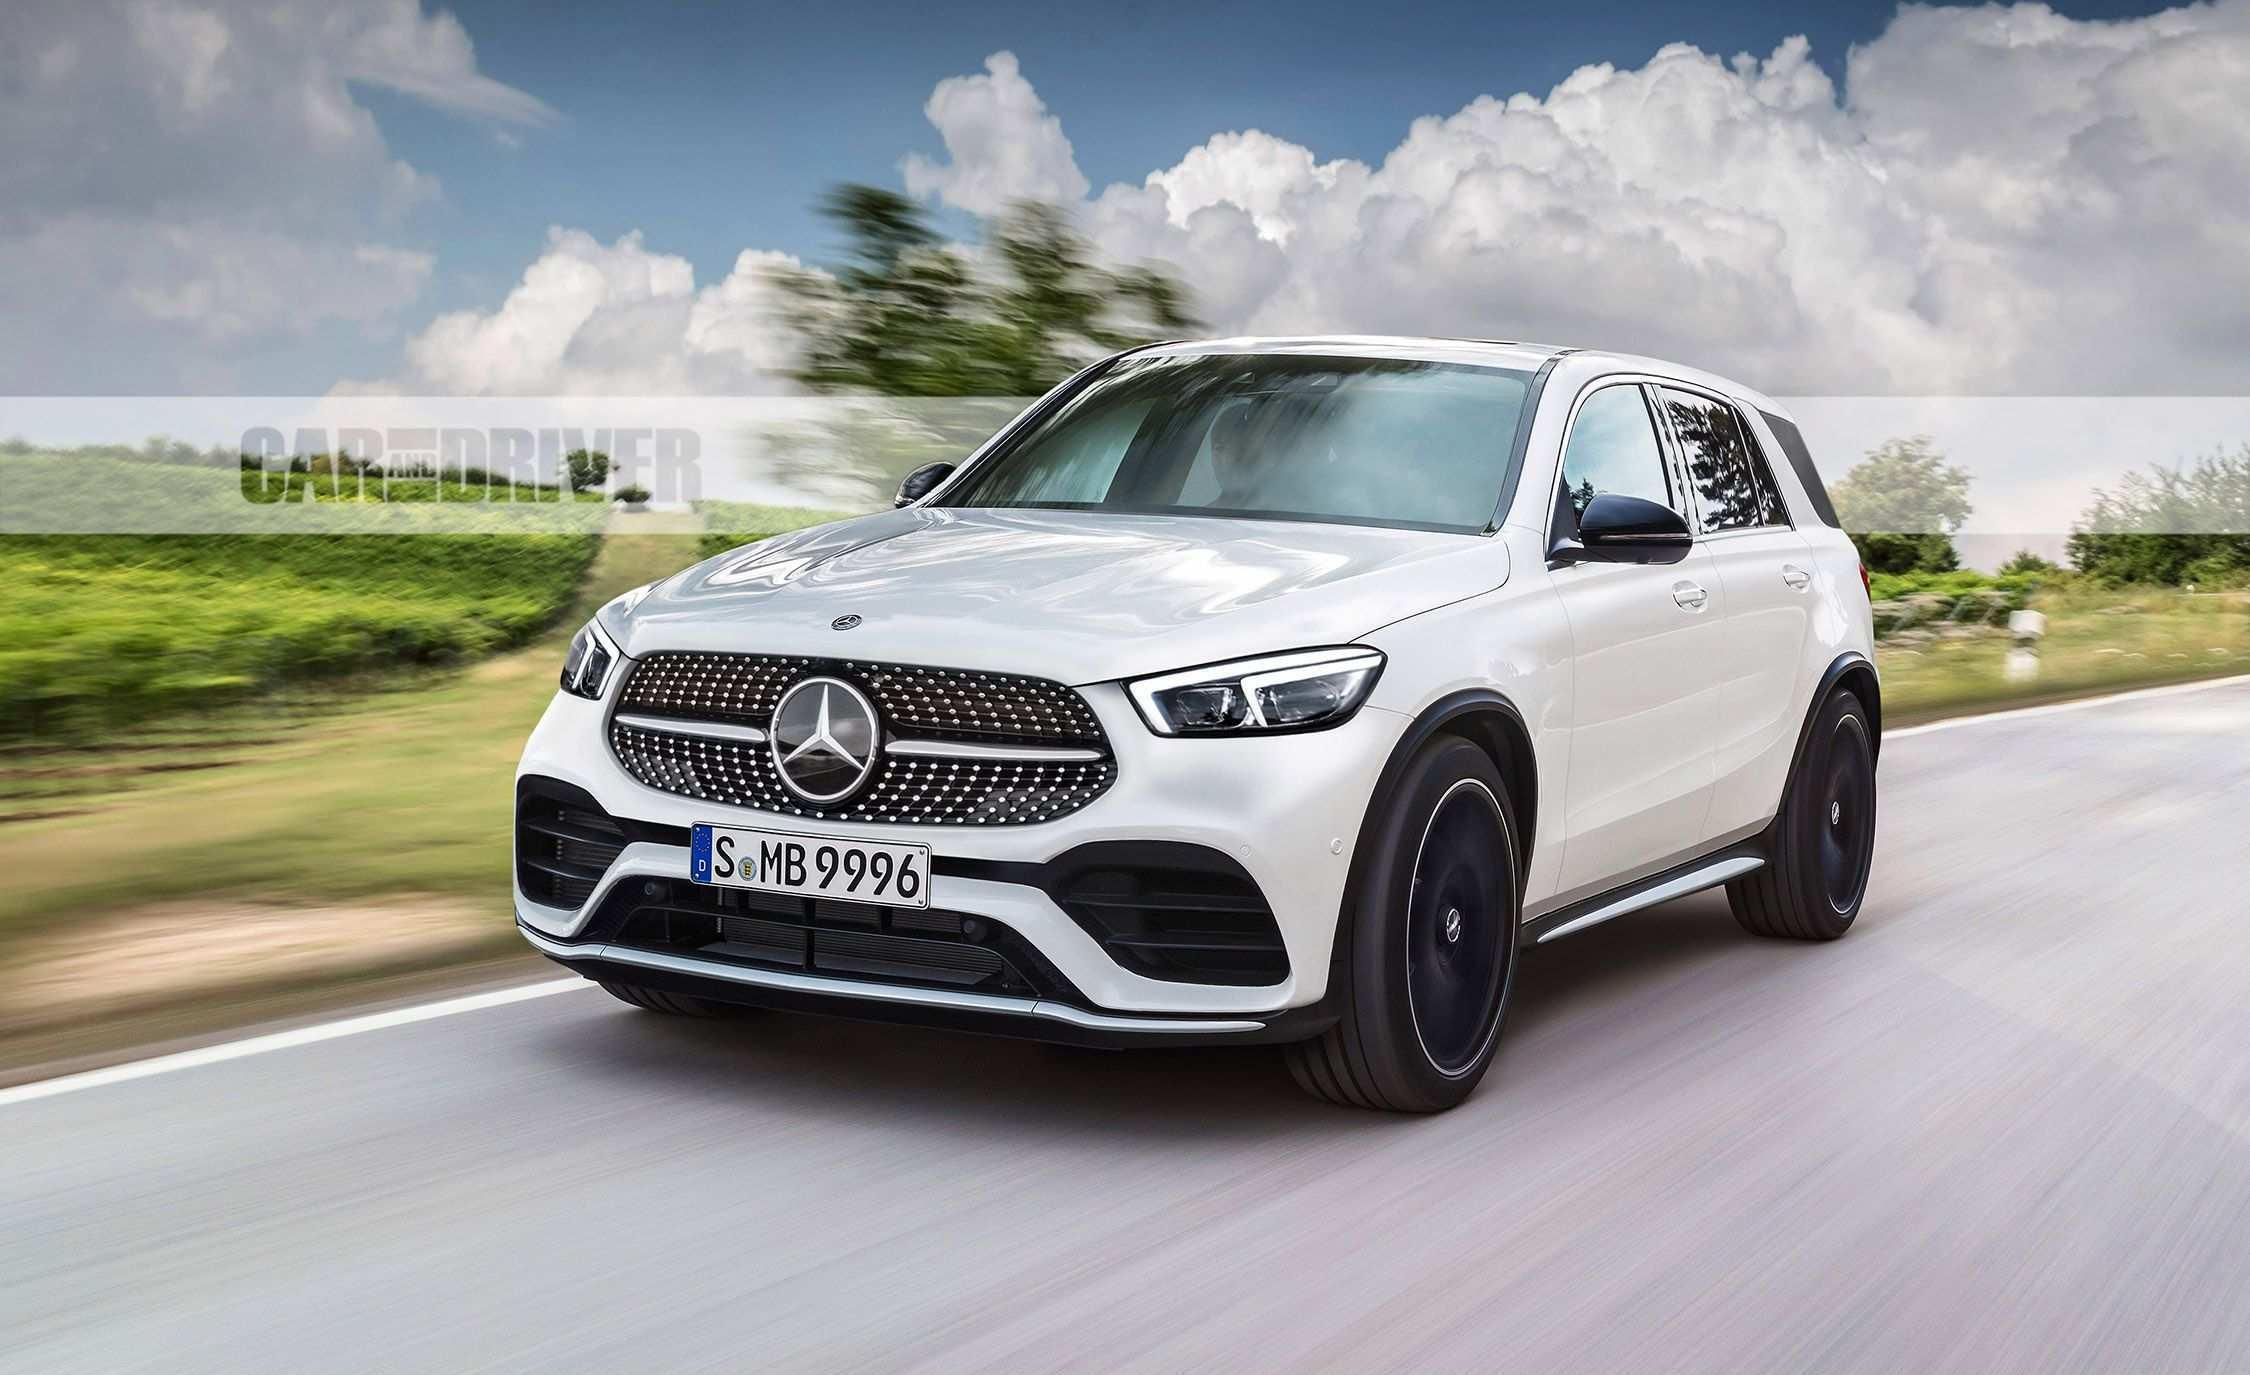 72 Best Review Ml Mercedes 2019 Rumors by Ml Mercedes 2019